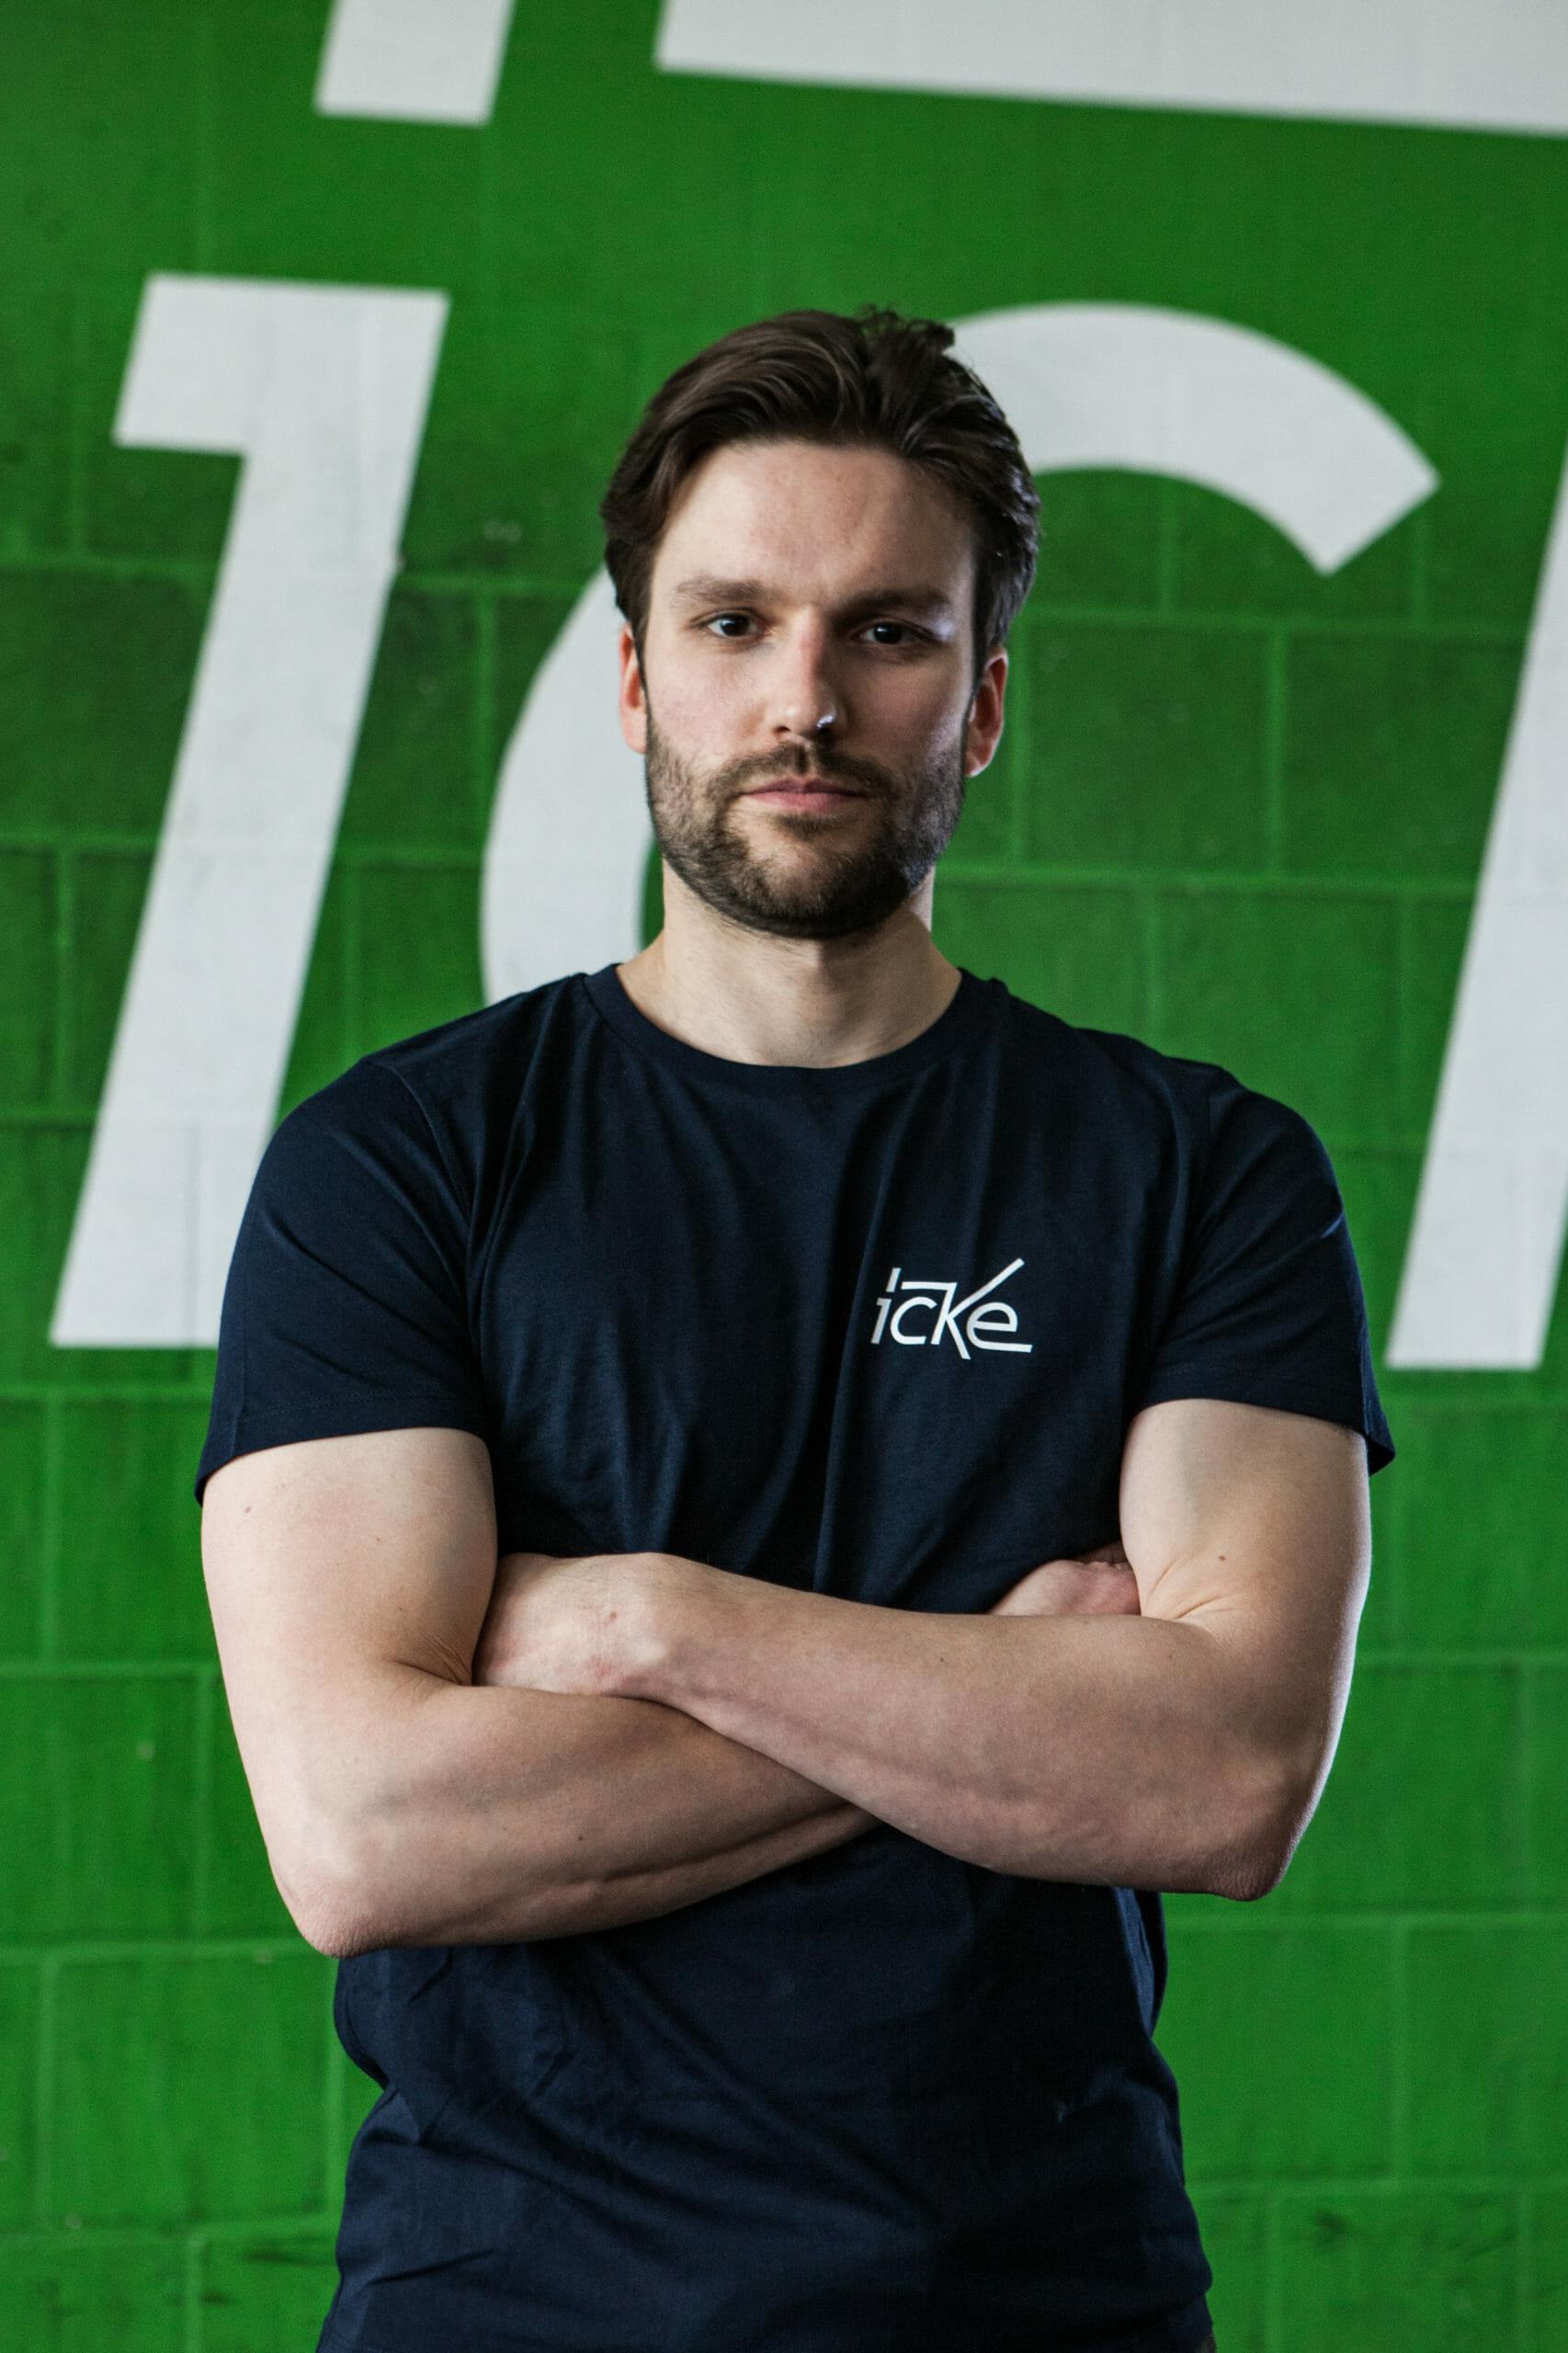 Christian Herwig - Team Icke Physiotherapie